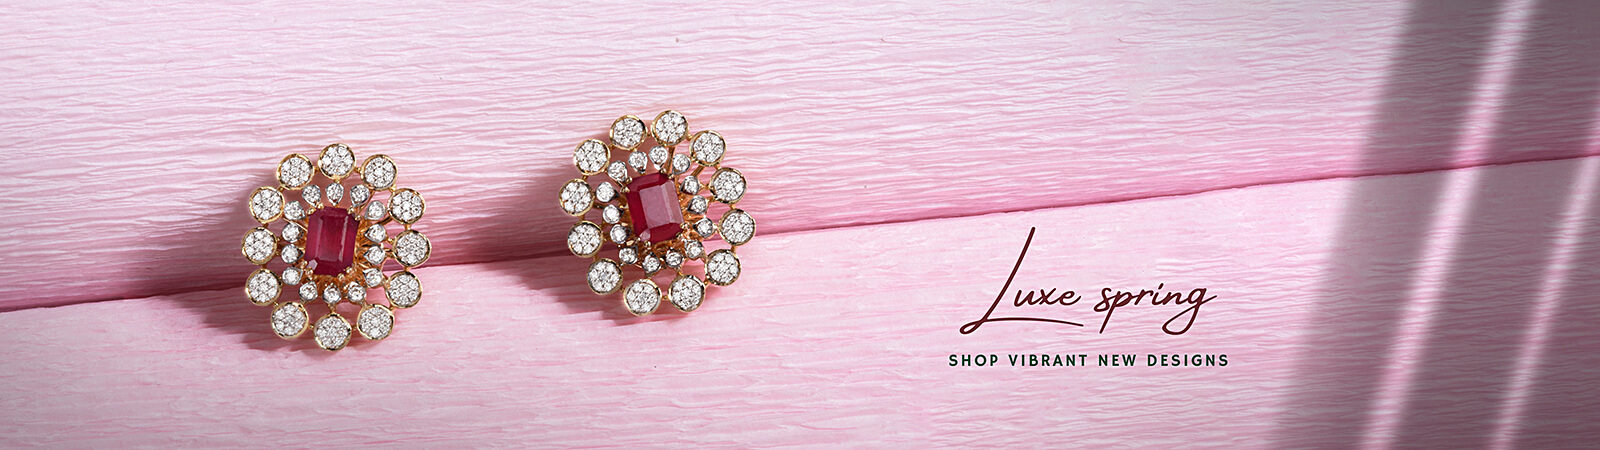 Spring hot VVS diamond & gold jewelry picks for 2021